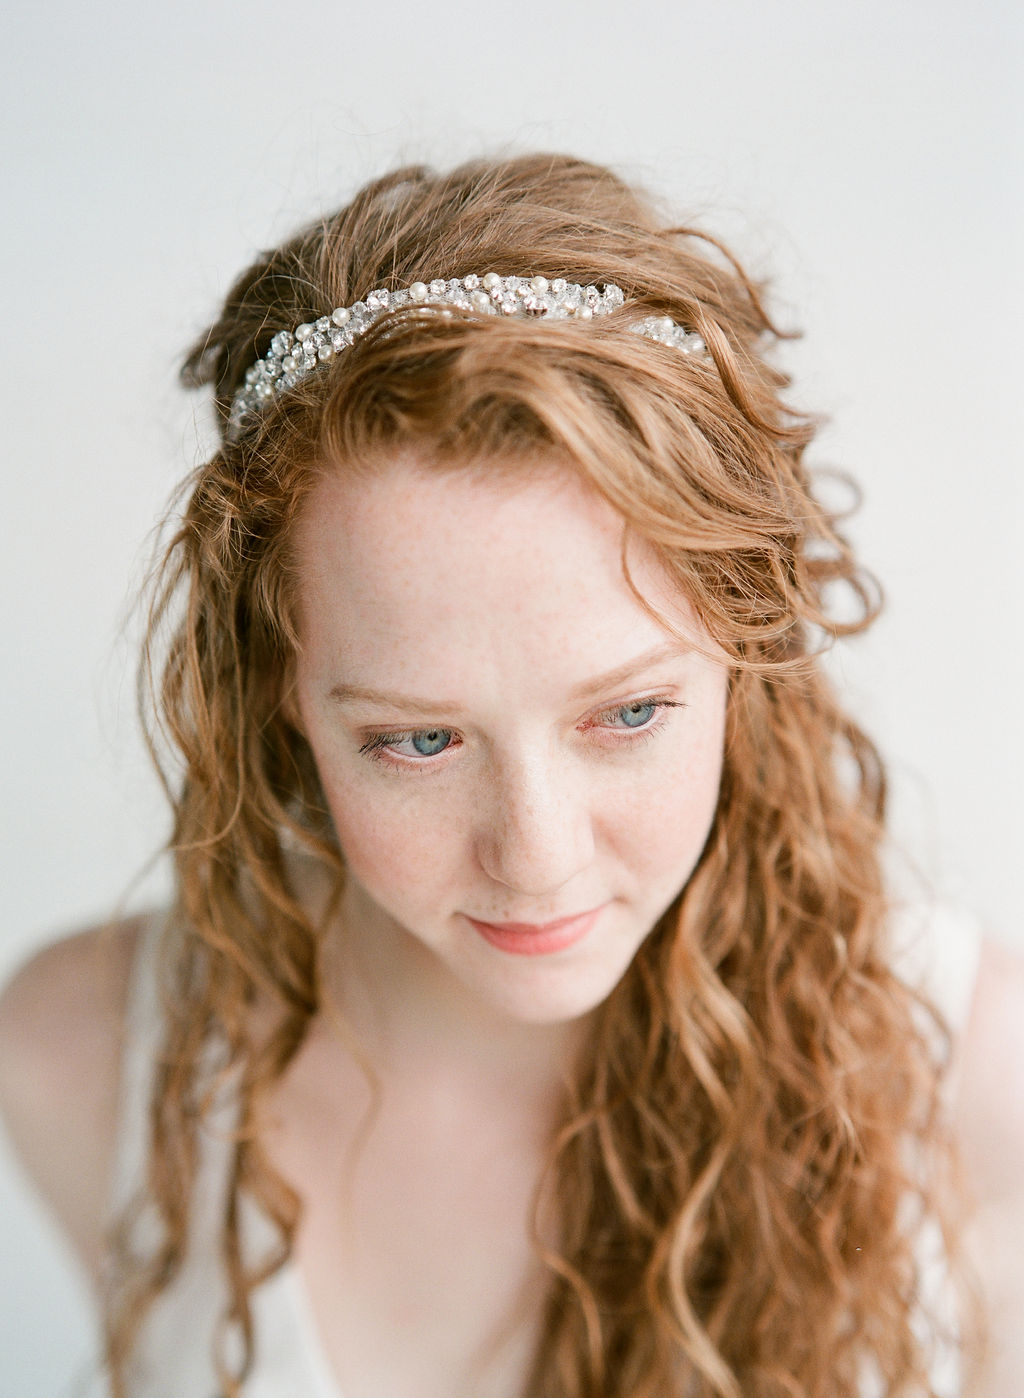 sarah_g_honest_ivory_sage_scarlet_wedding_bridal_dress_photography-15.JPG